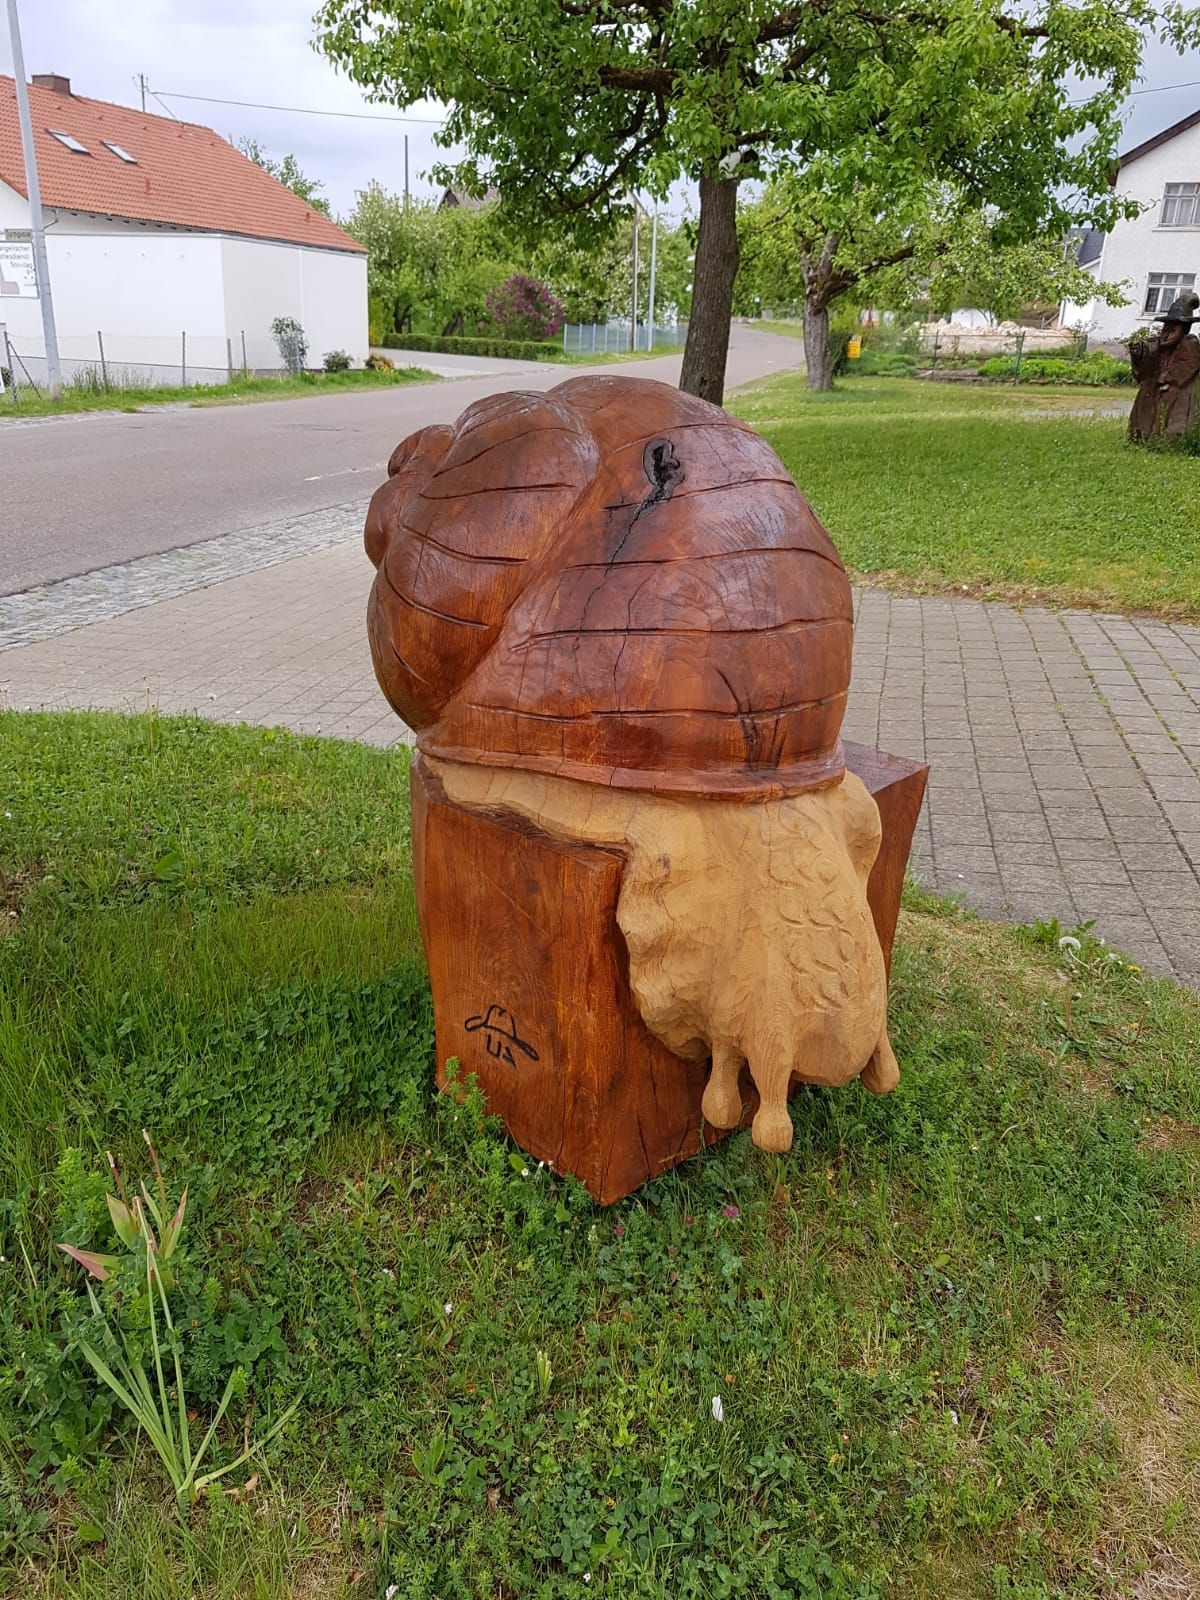 Holz Motorsägen Schnitzen Kettensäge Skulptur Kunst Wood Carving Schnecke